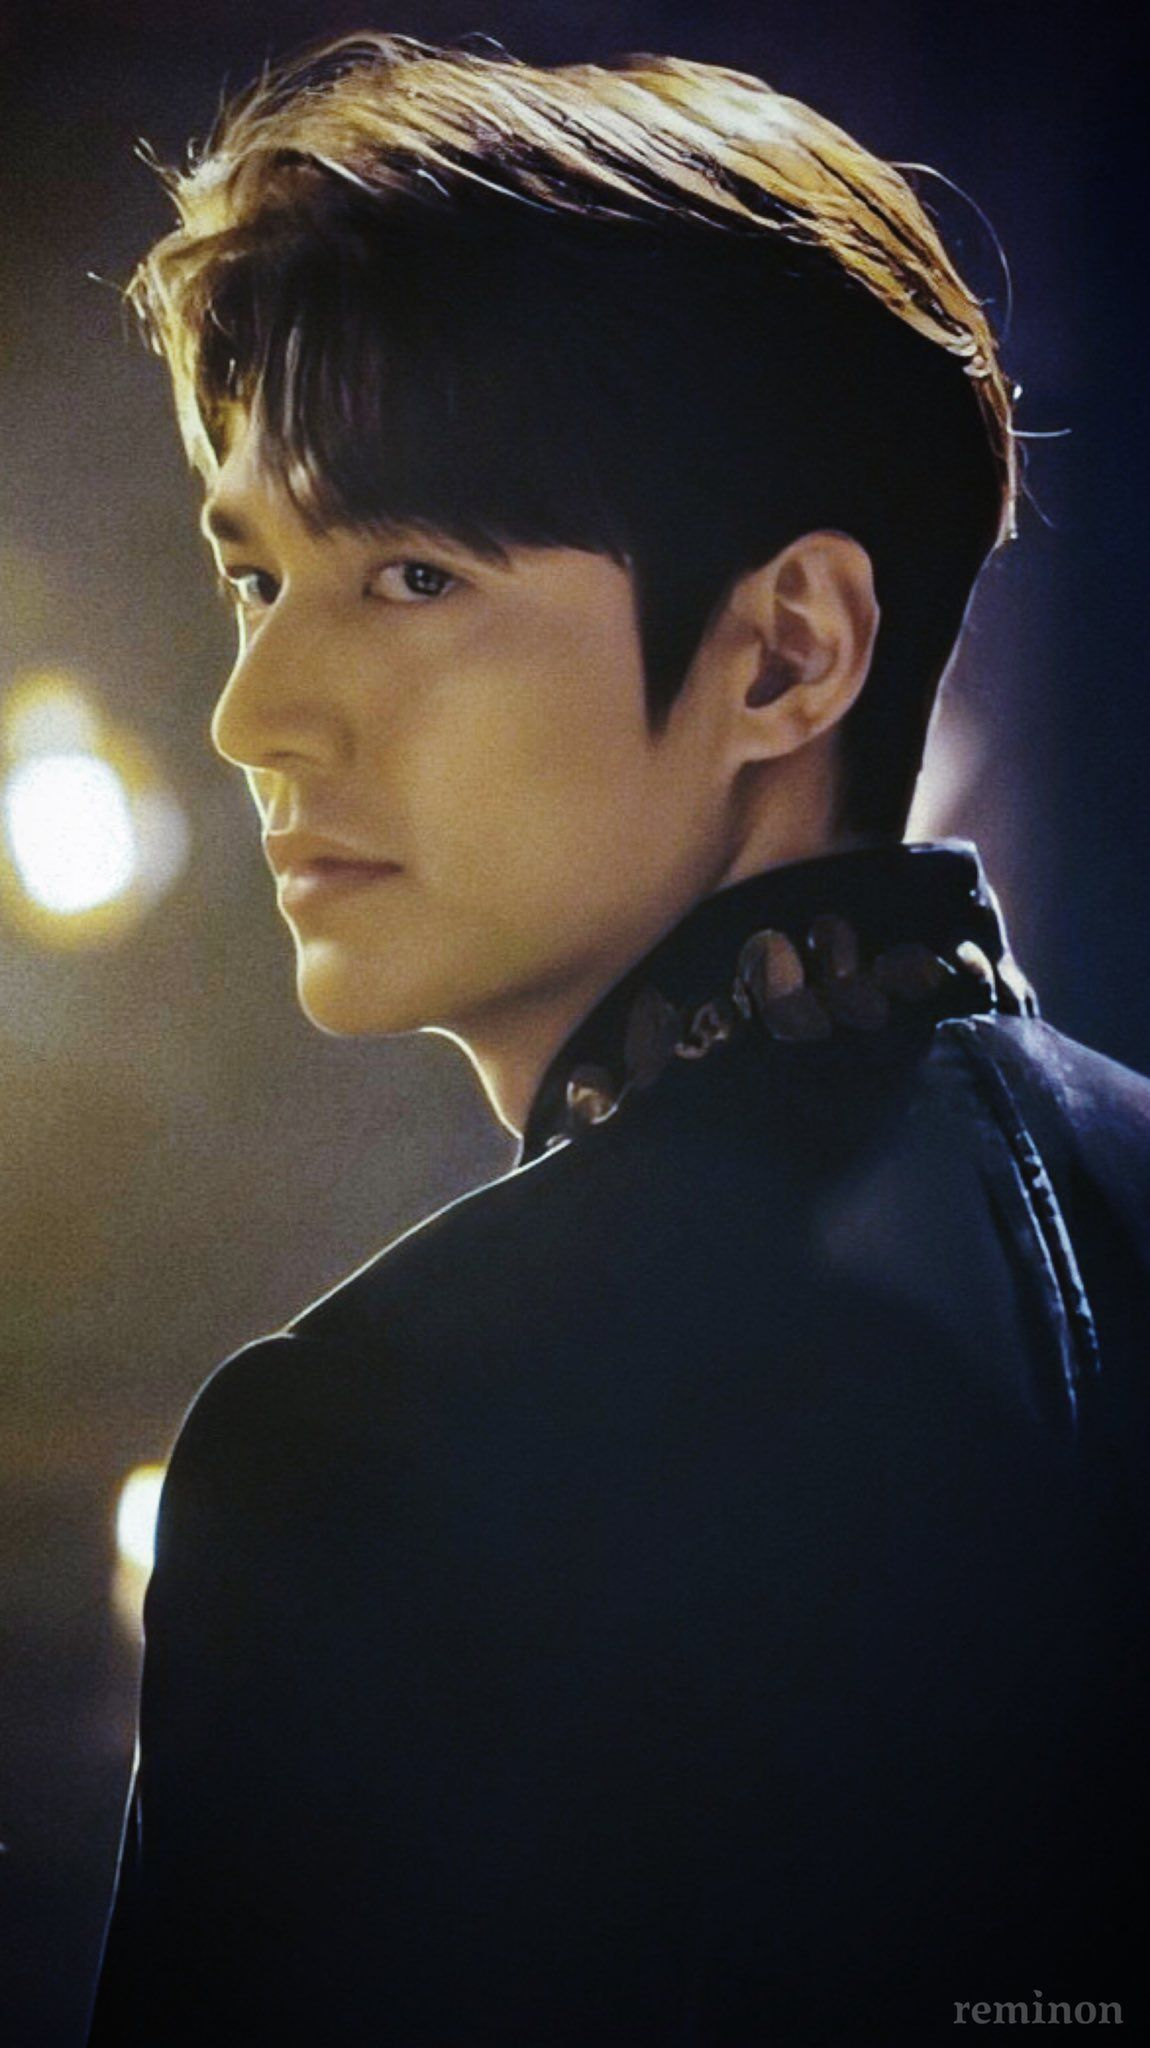 Lee Min Ho, The King, 2020. | Aktor, Gambar, Animasi